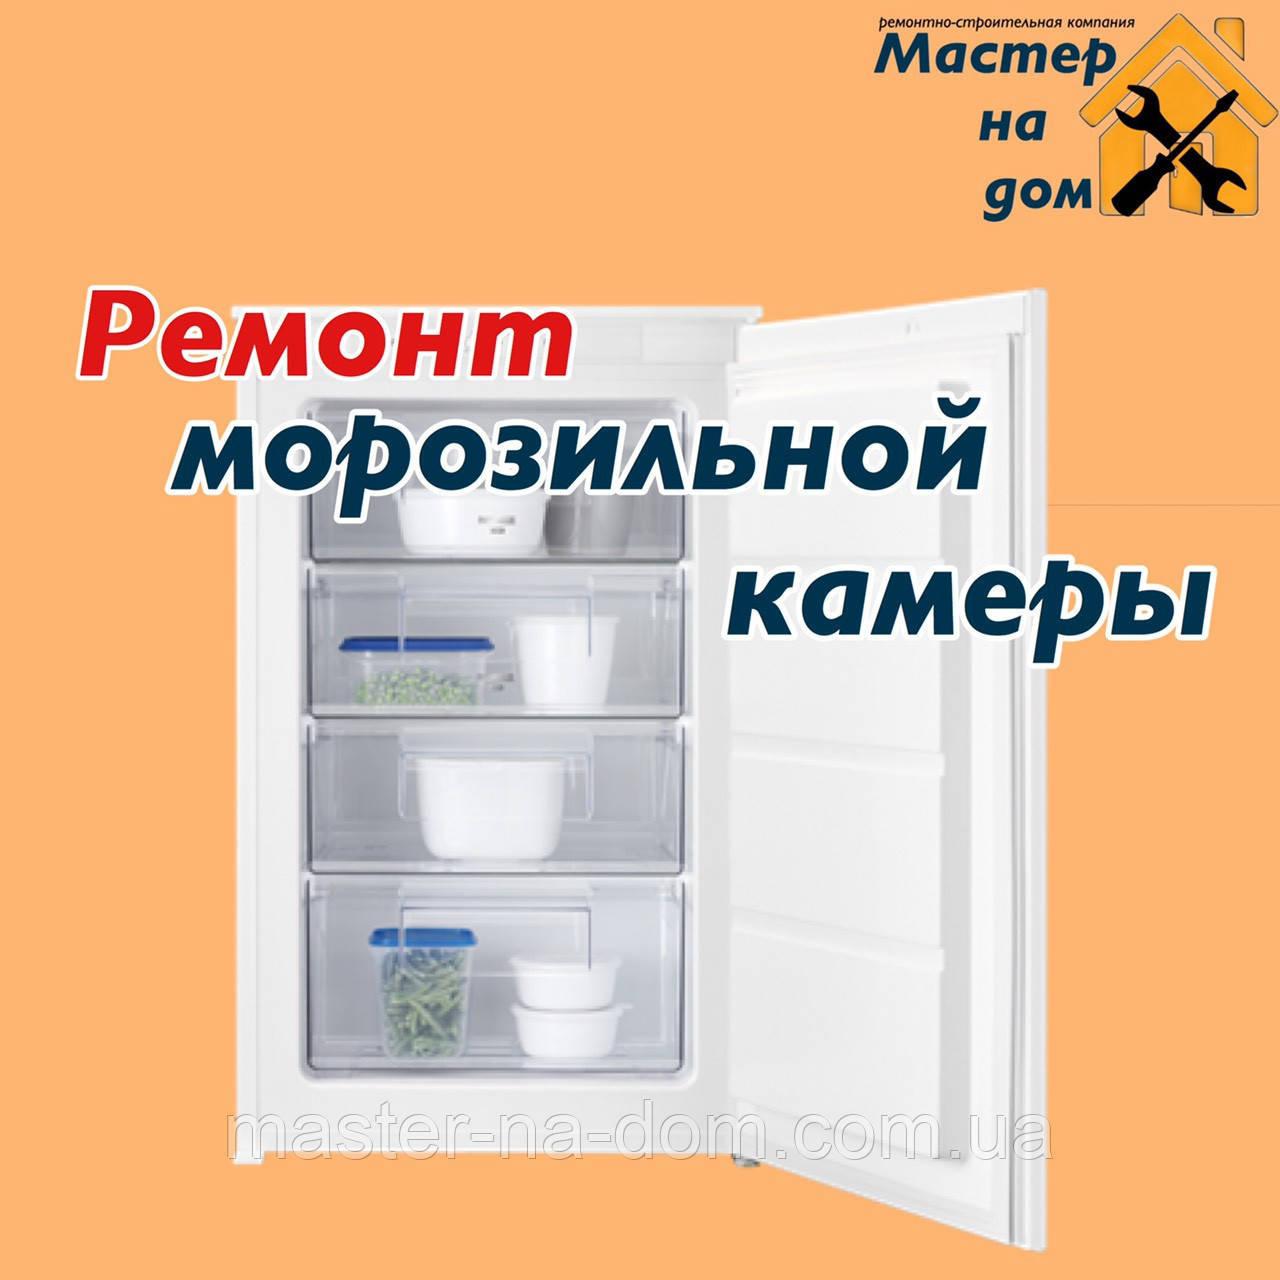 Ремонт морозильної камери у Луцьку